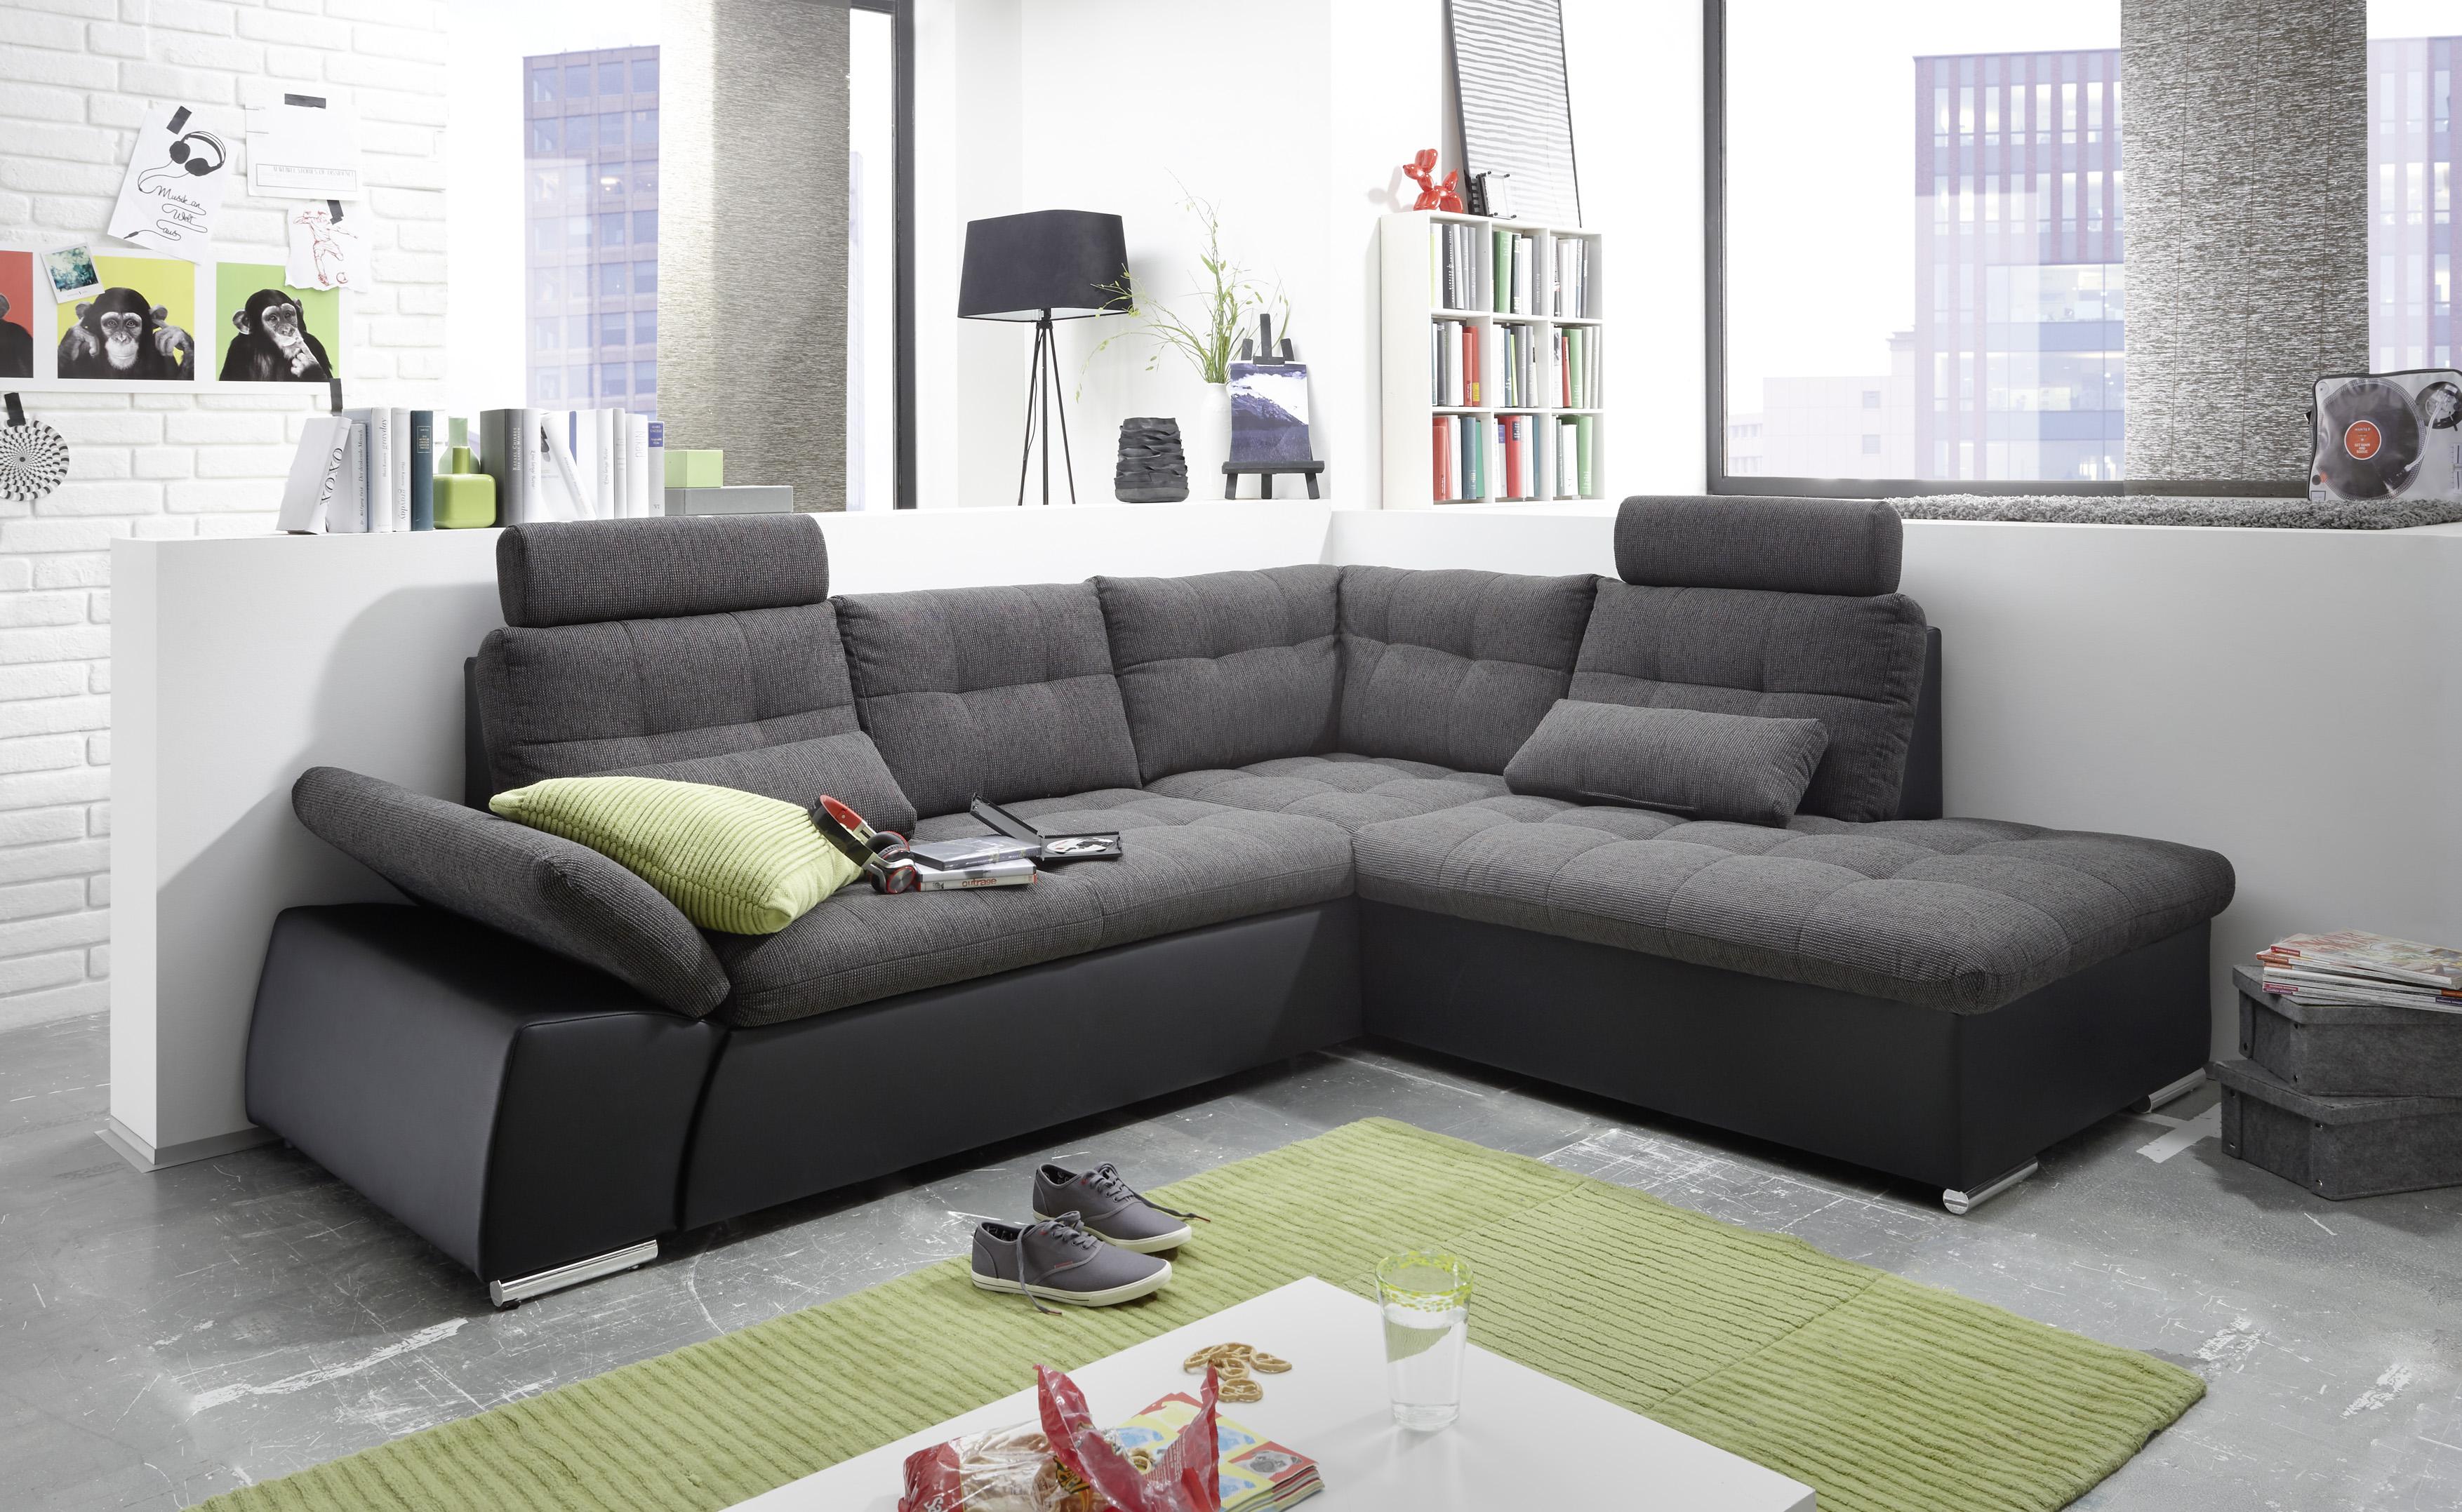 ecksofa jak couch schlafcouch sofa lederlook schwarz grau. Black Bedroom Furniture Sets. Home Design Ideas